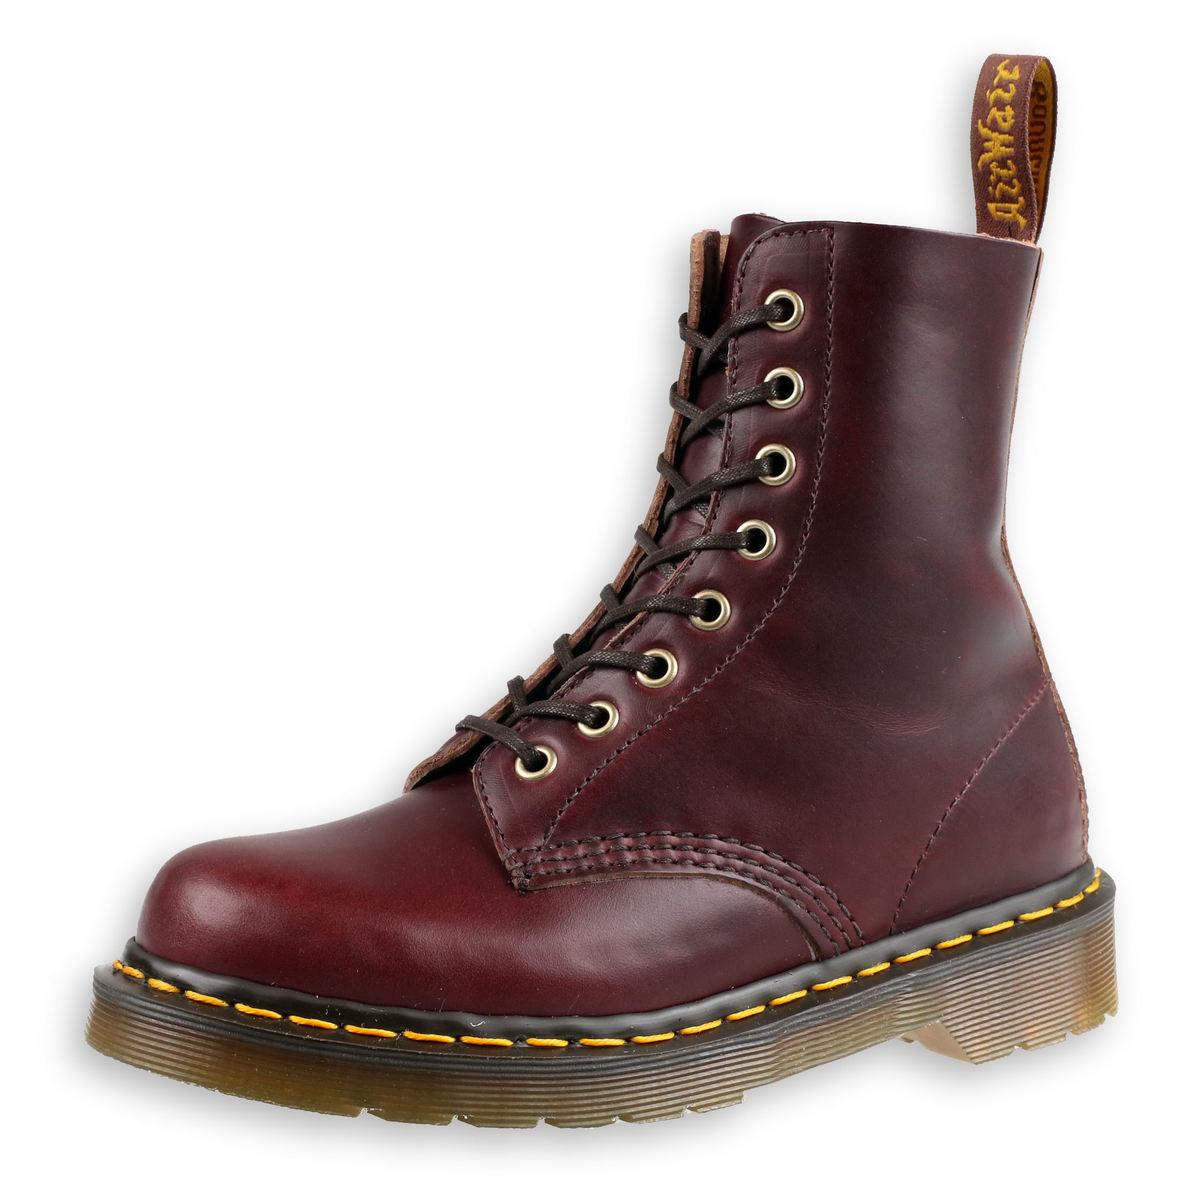 topánky Dr. Martens - 8 dierkové - Burgundy - 1460 Pascal - DM24196606